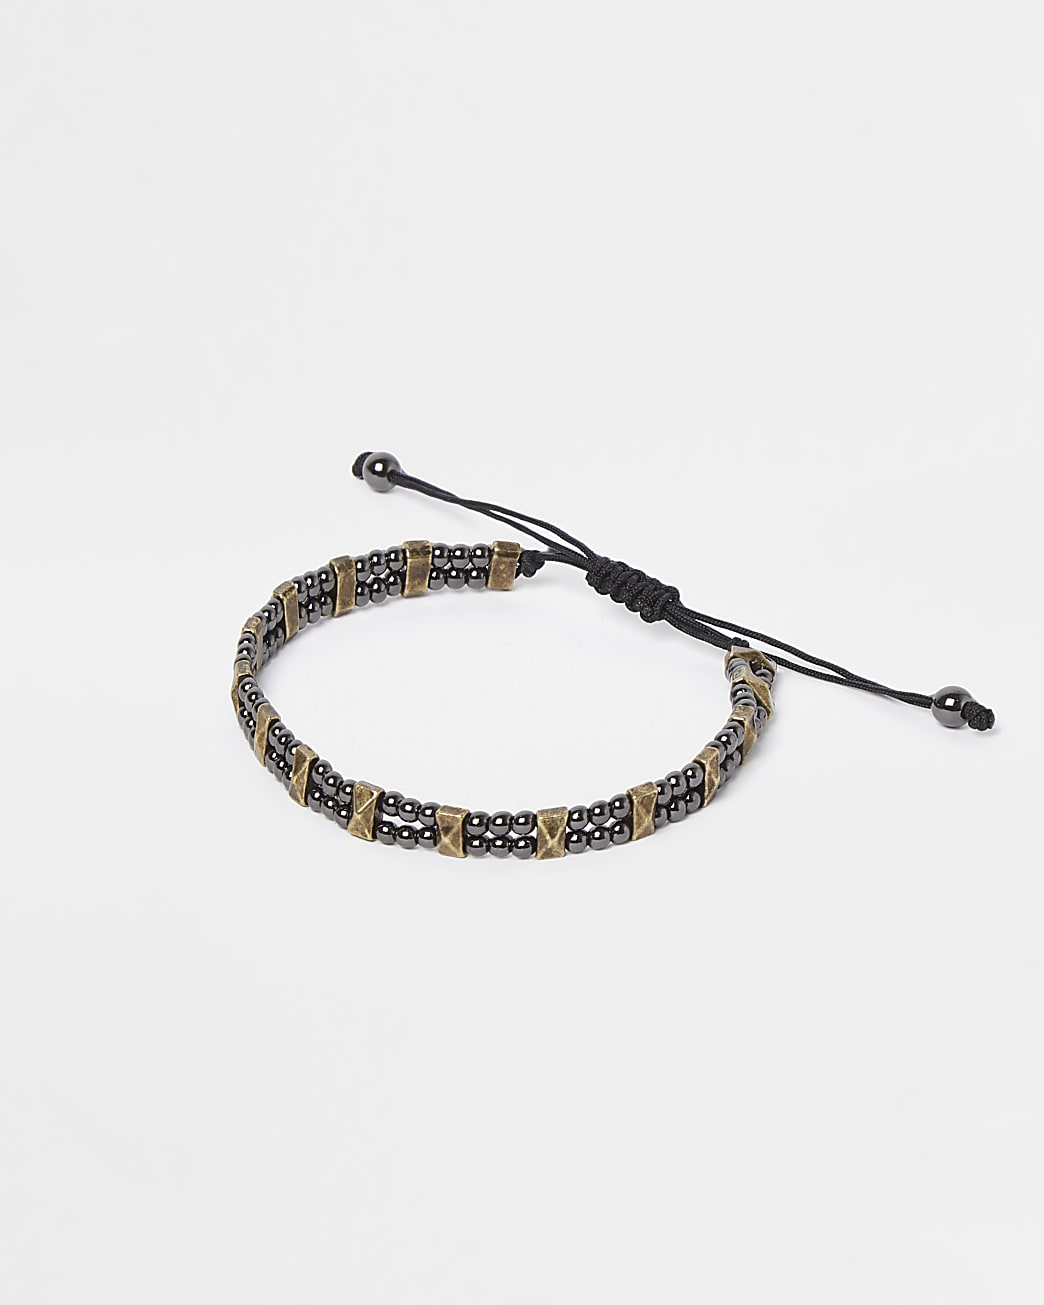 Black beaded adjustable bracelet